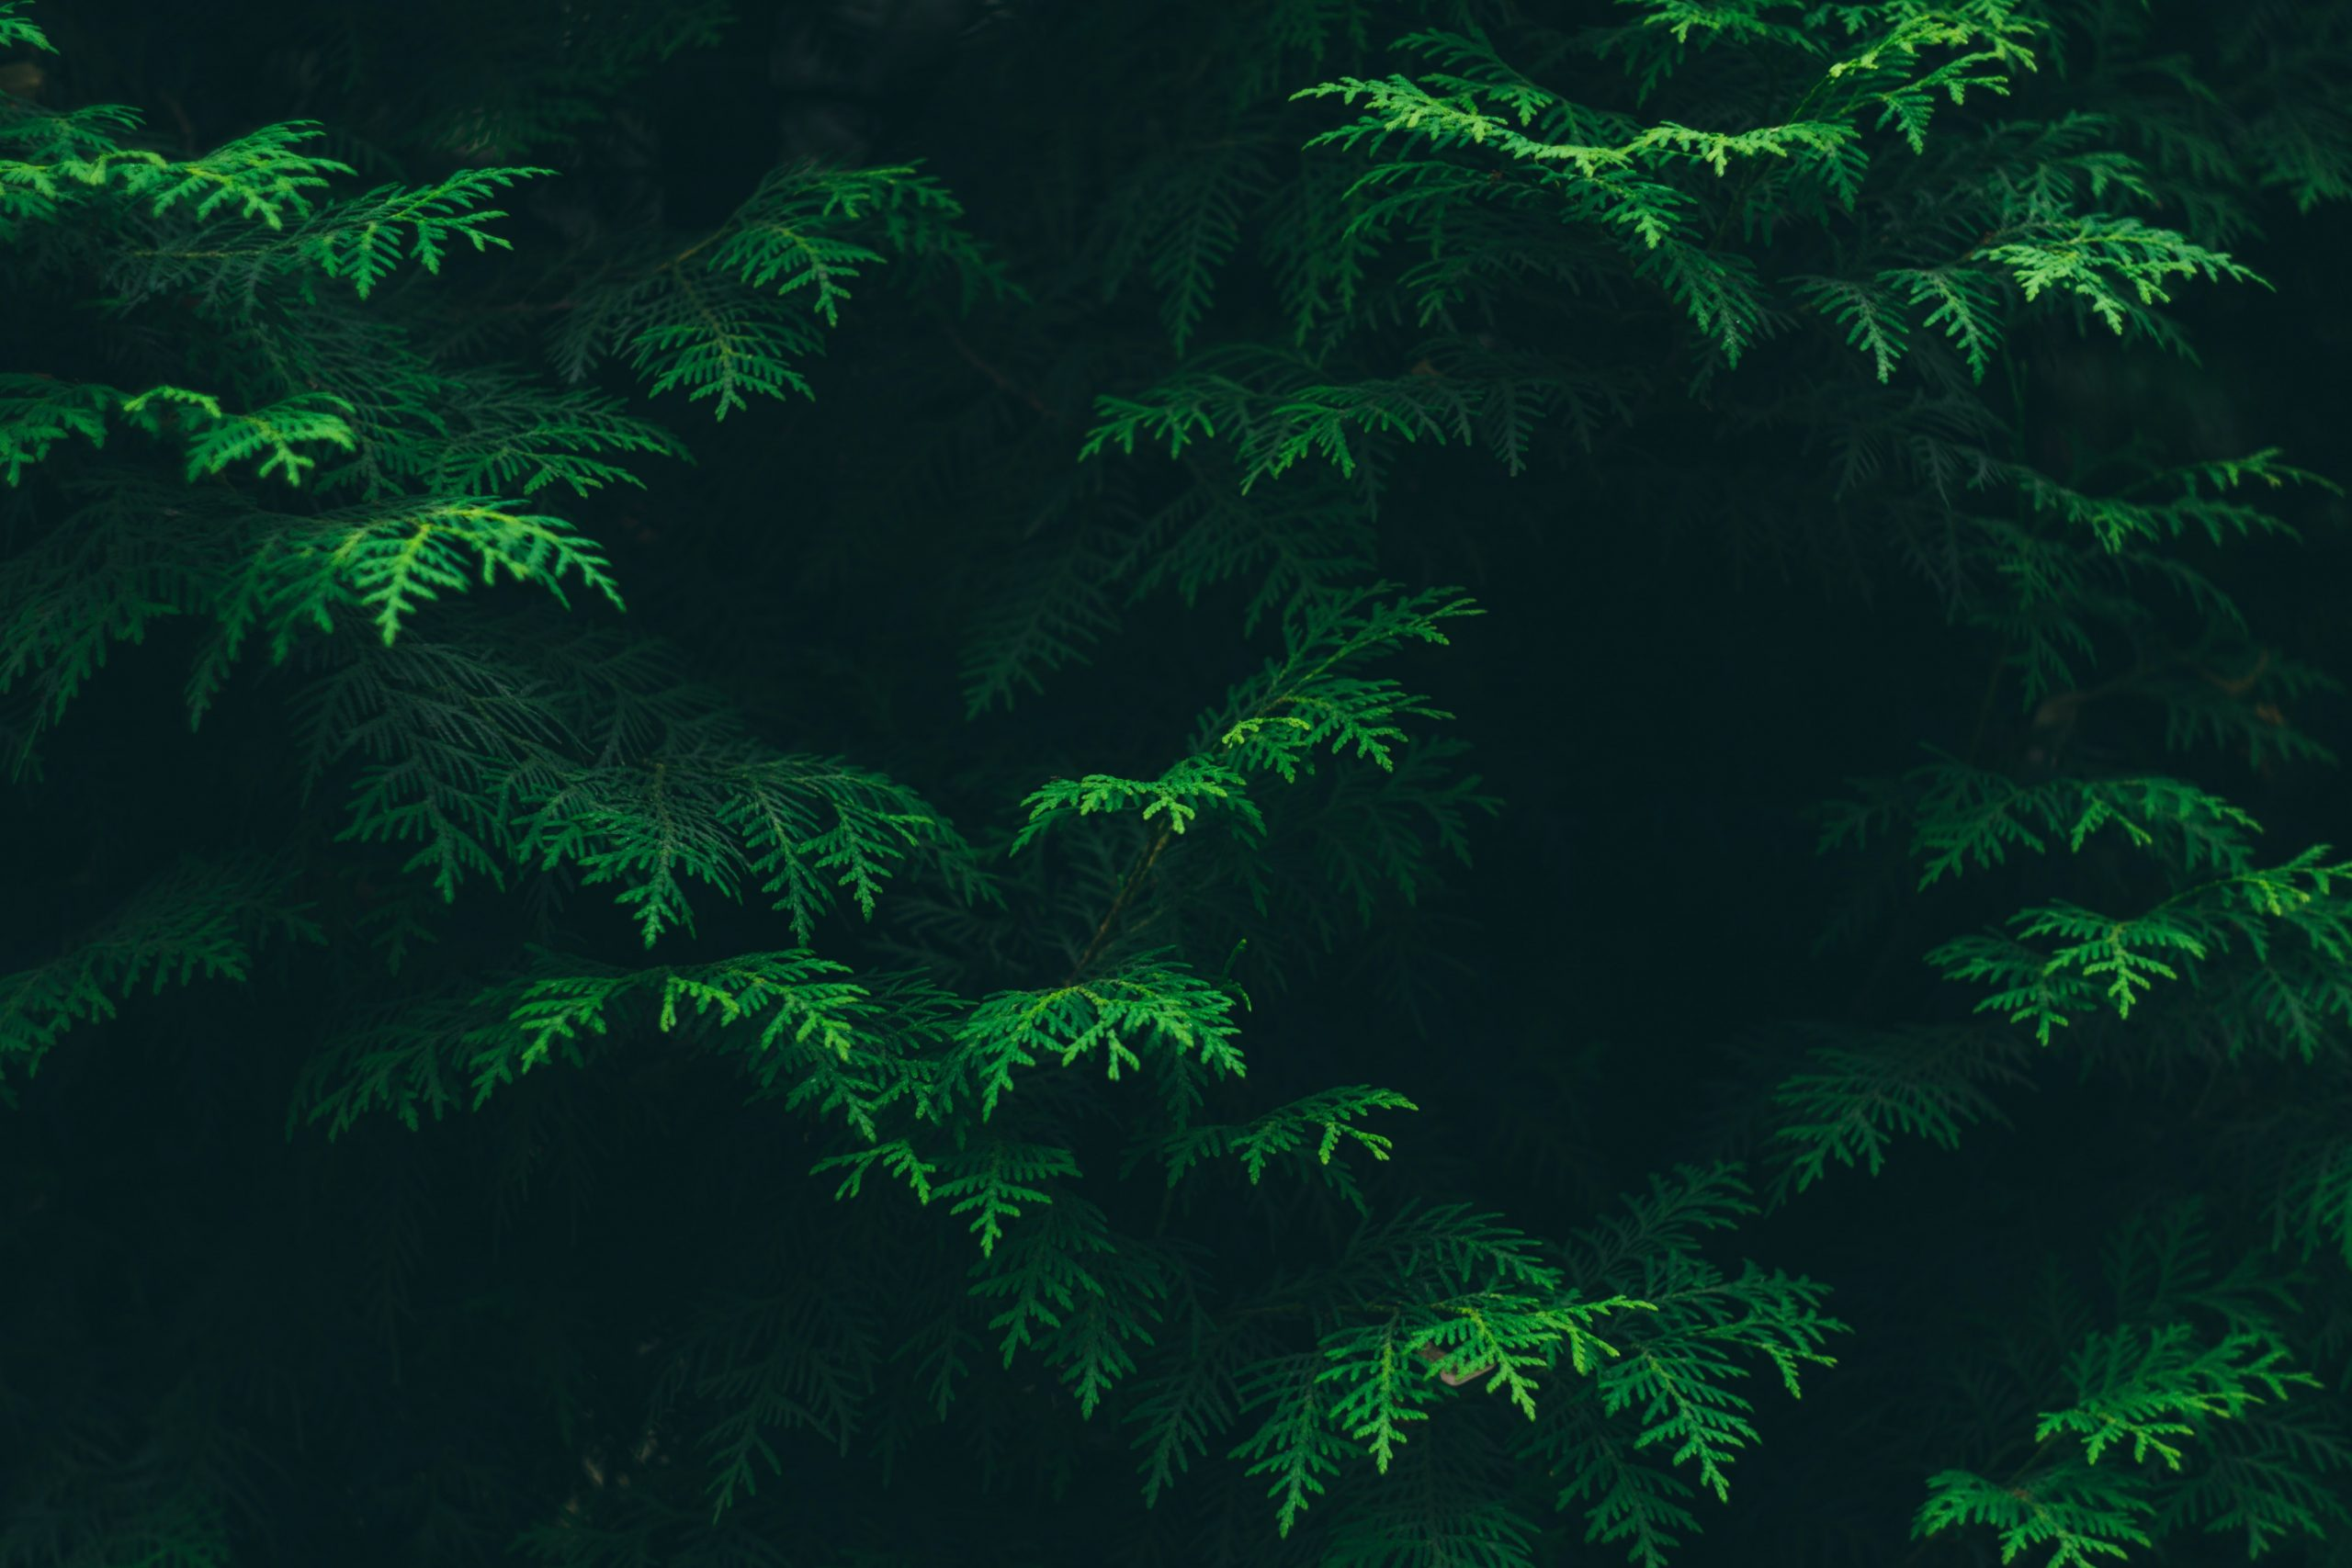 green-pine-tree-leaves-192136